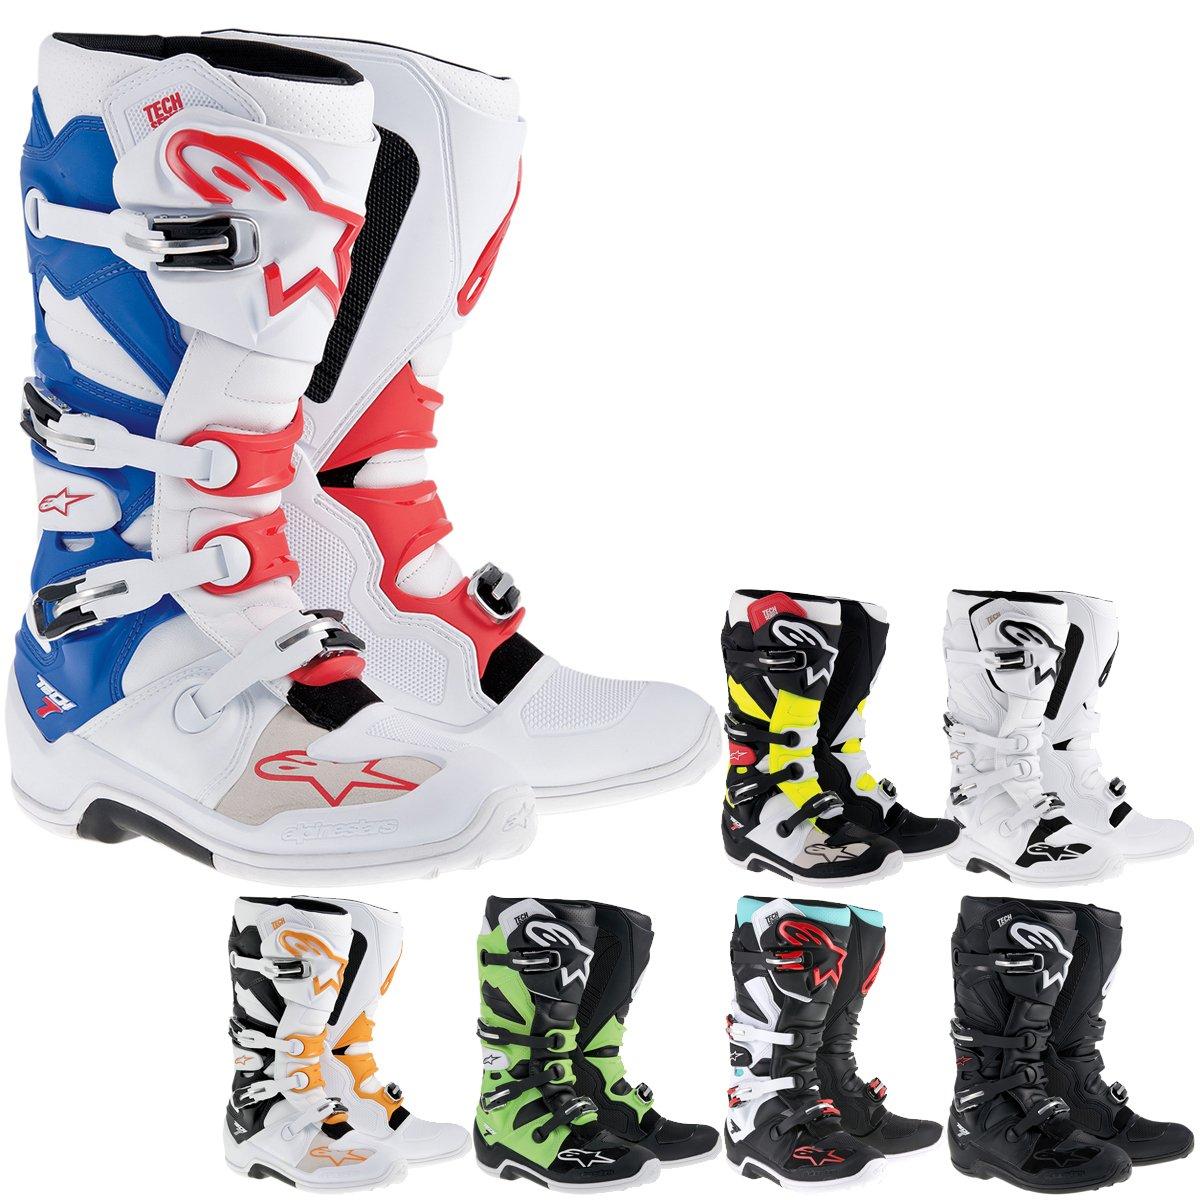 Alpinestars Tech 7 Boots-White-6 B00ENZZDOQ 6